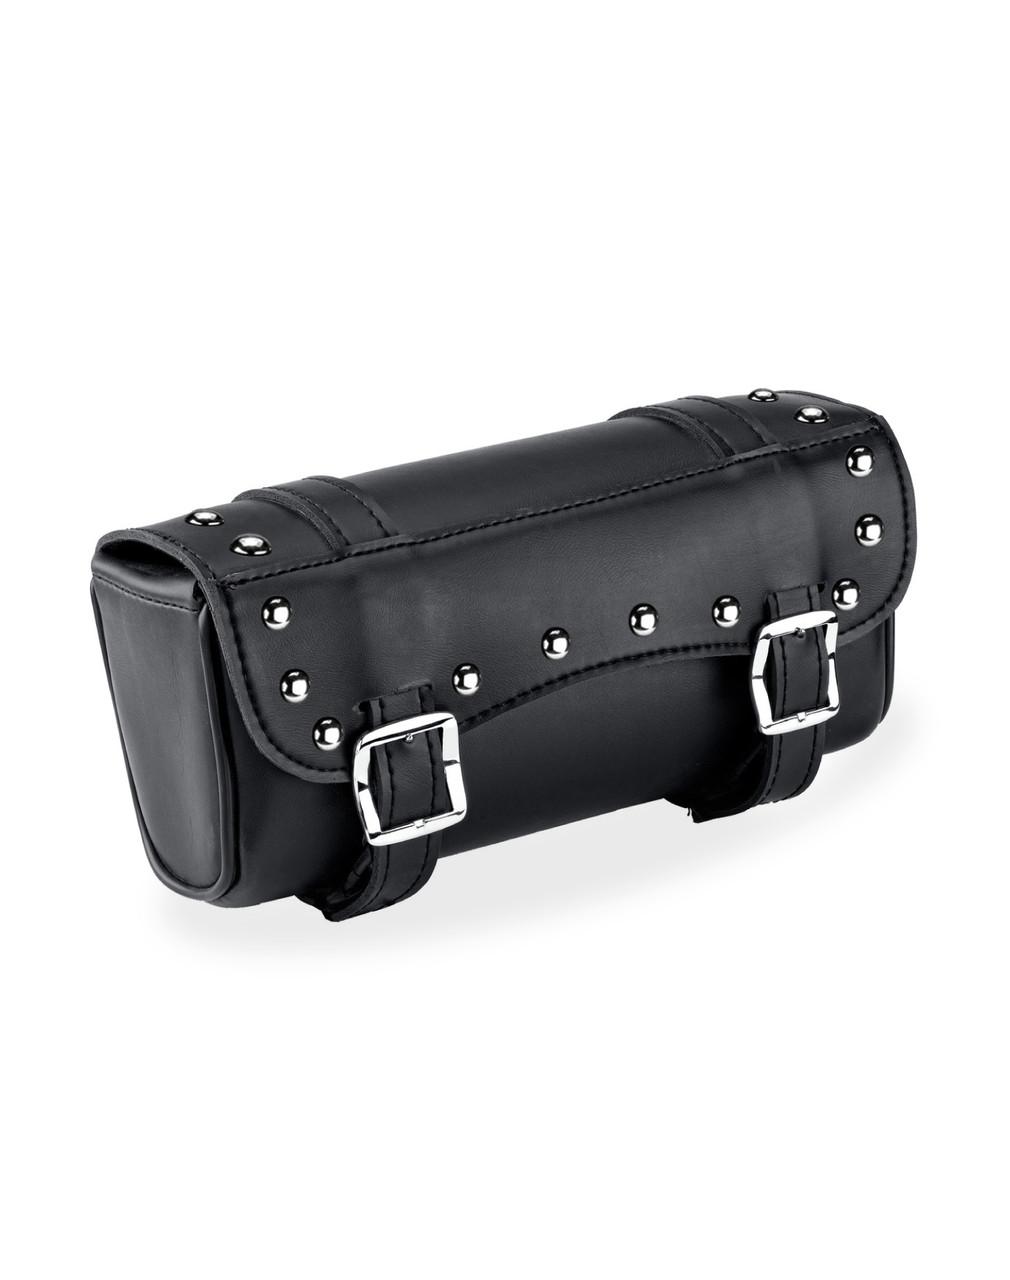 Victory Medium Universal Studded Motorcycle Tool Bag Main Bag View